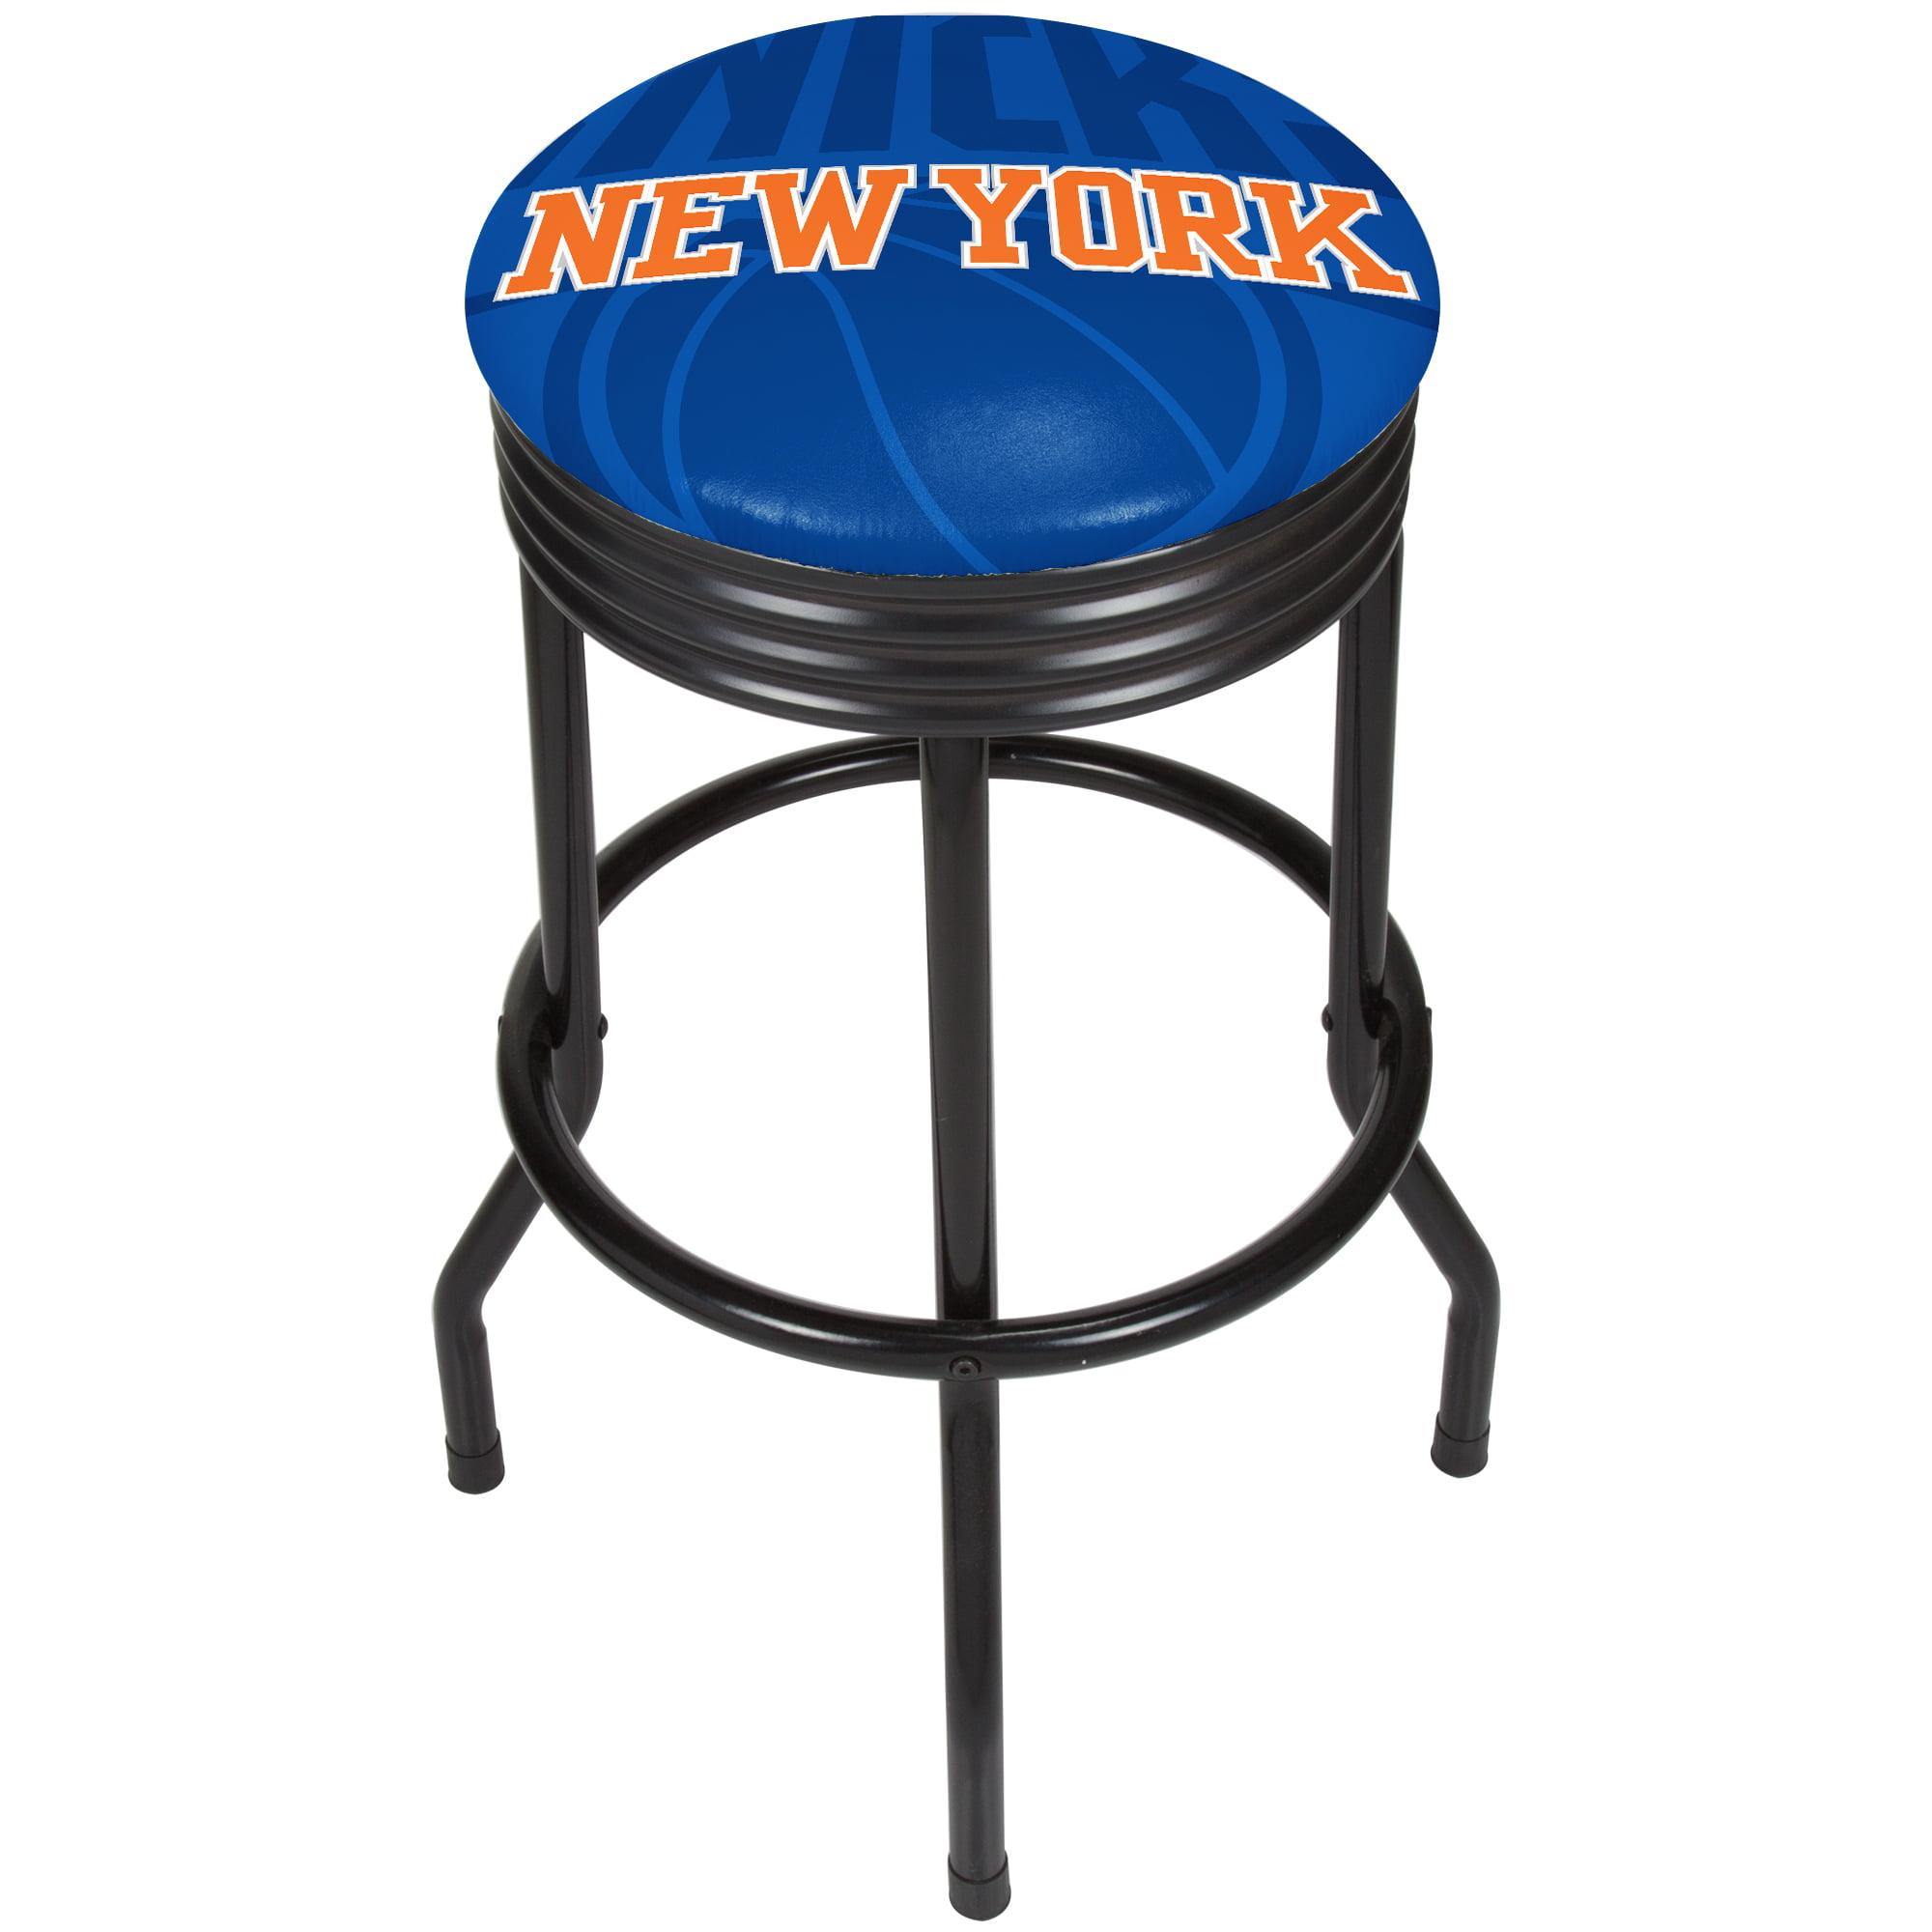 NBA Black Ribbed Bar Stool - Fade - New York Knicks